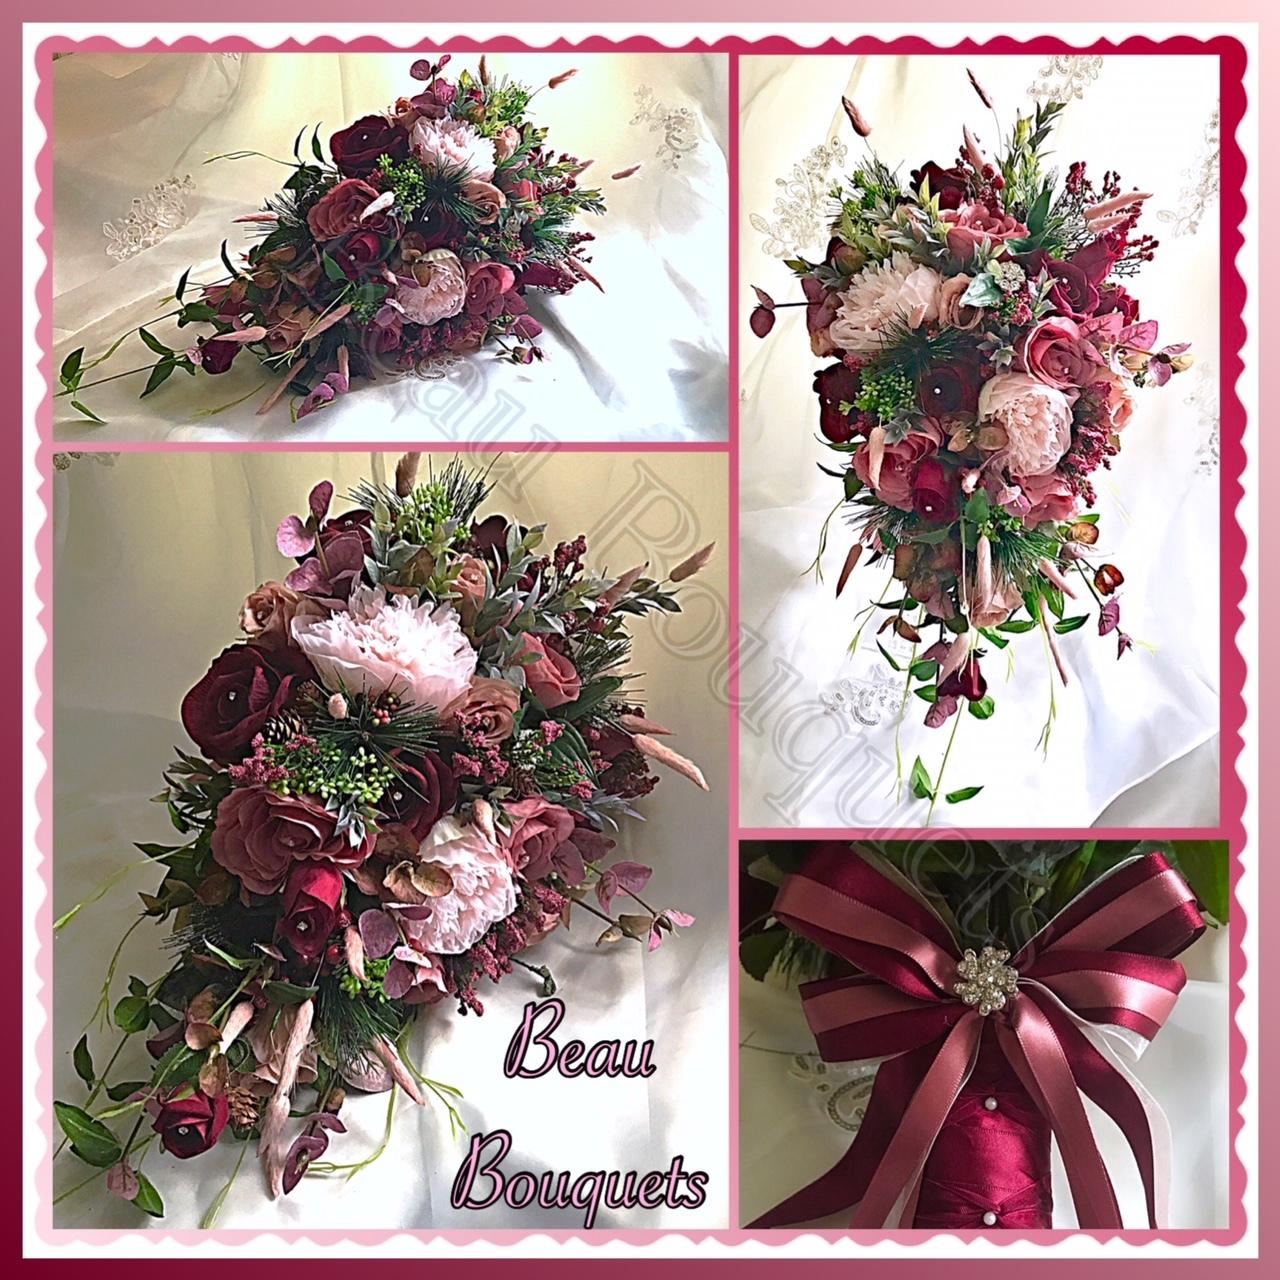 TRUE LOVE - Cascade bride bouquet package Wintry burgundy & dusky pink roses, spruce, fir cones, berries adn dusky green foliage